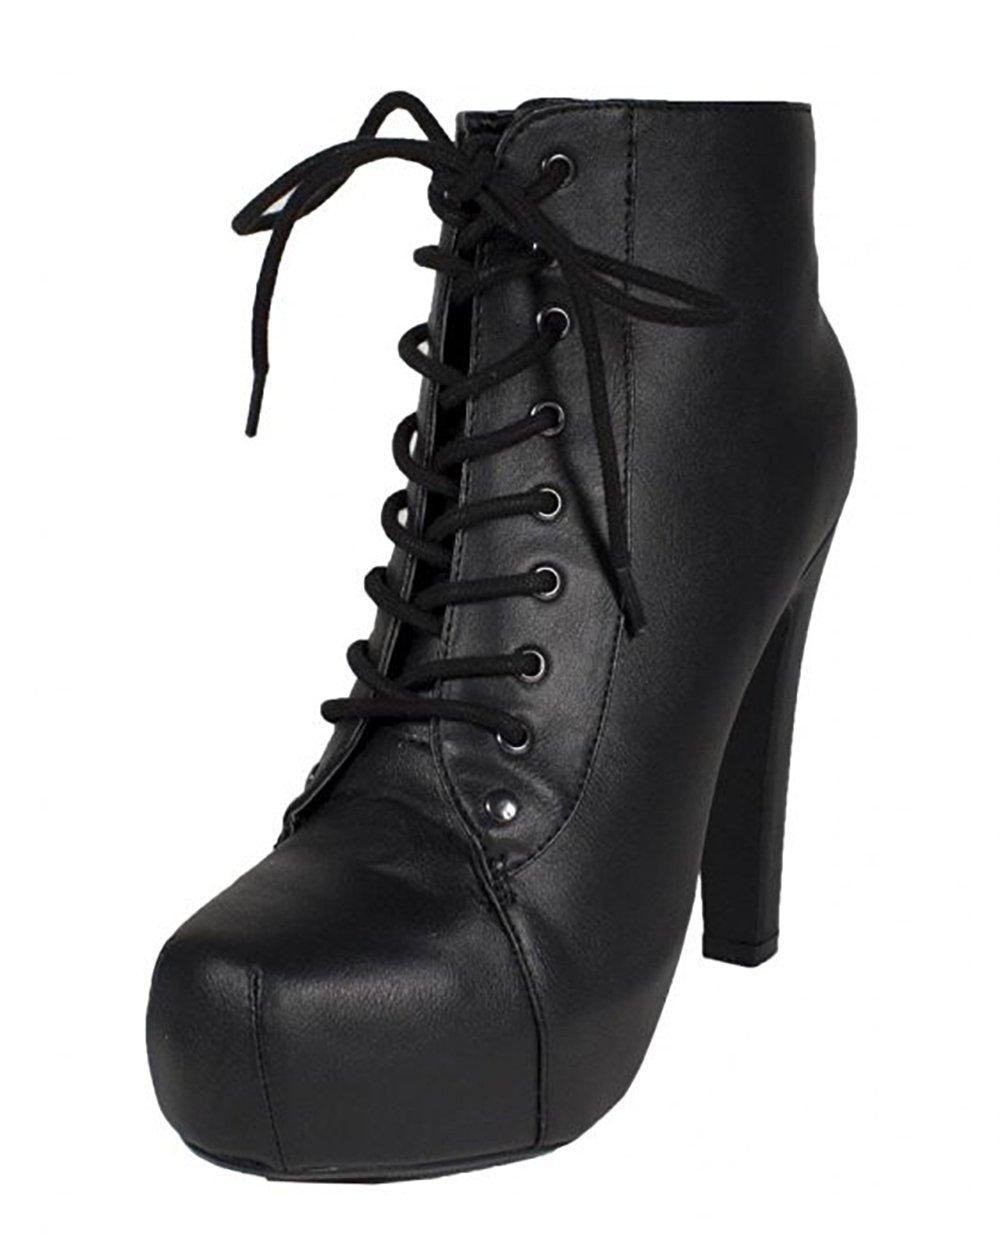 Scala-S Bootie Boots MVE Shoes.